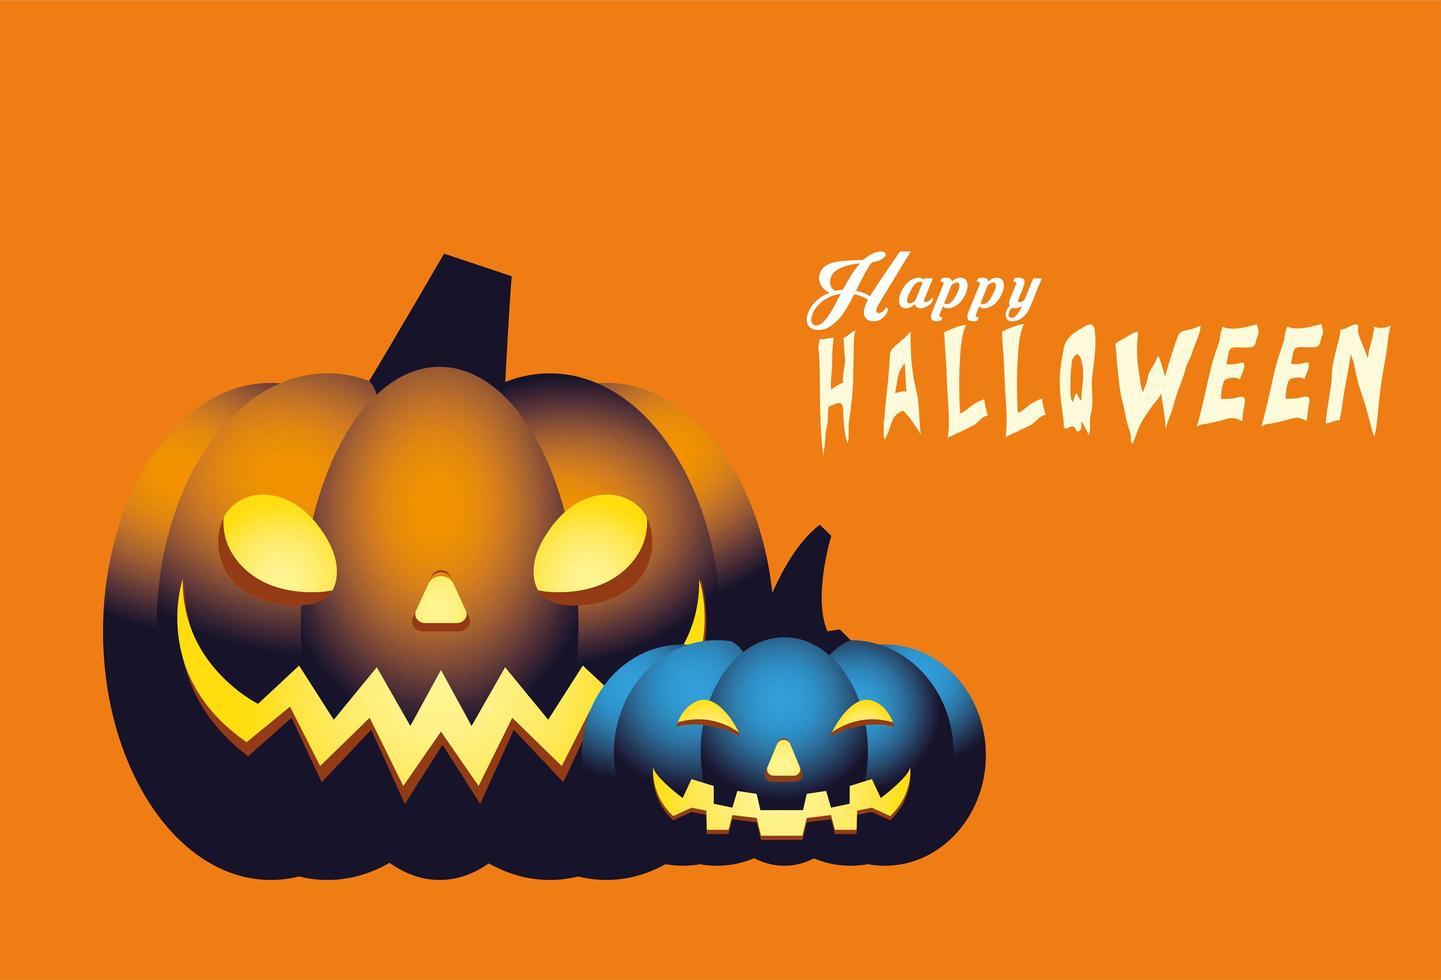 Halloween blau und orange Kürbisse Cartoons Vektor-Design vektor